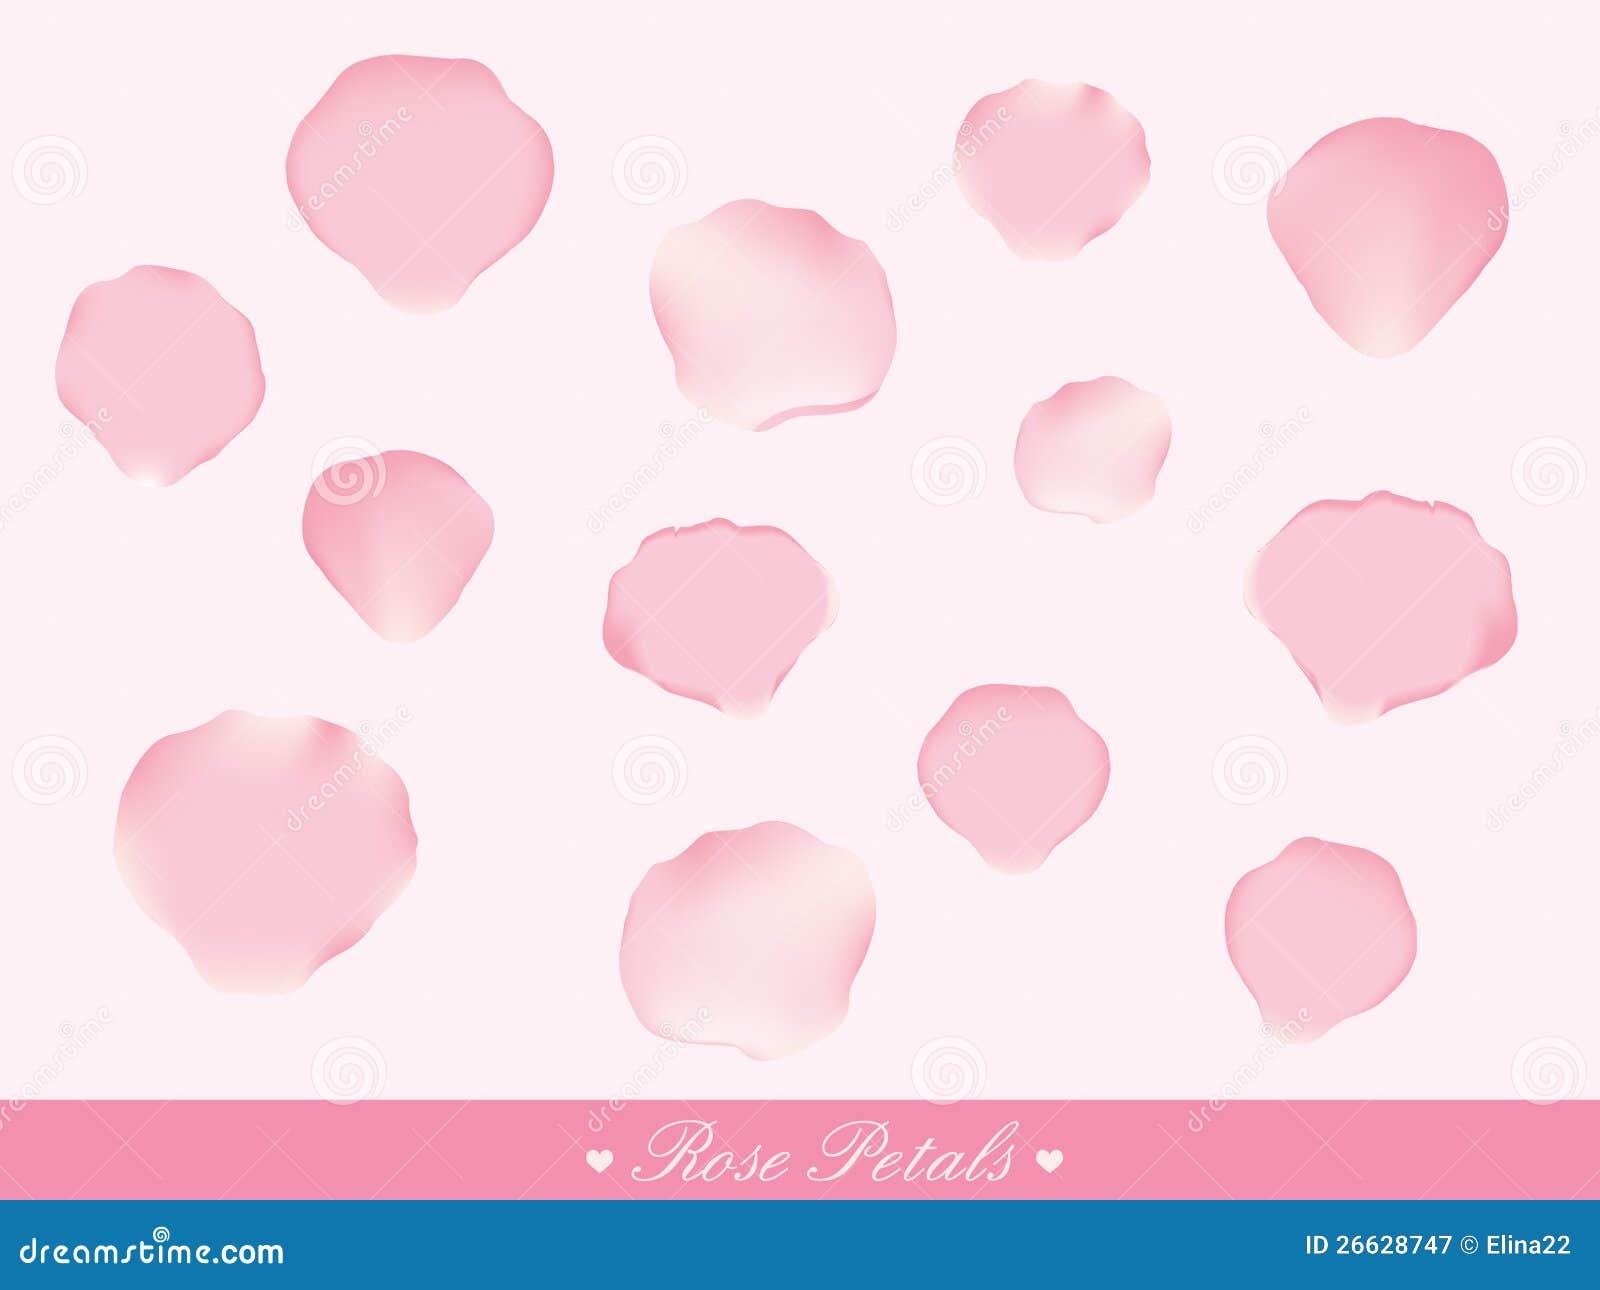 Pink Rose Petals Royalty Free Stock Photography - Image: 26628747